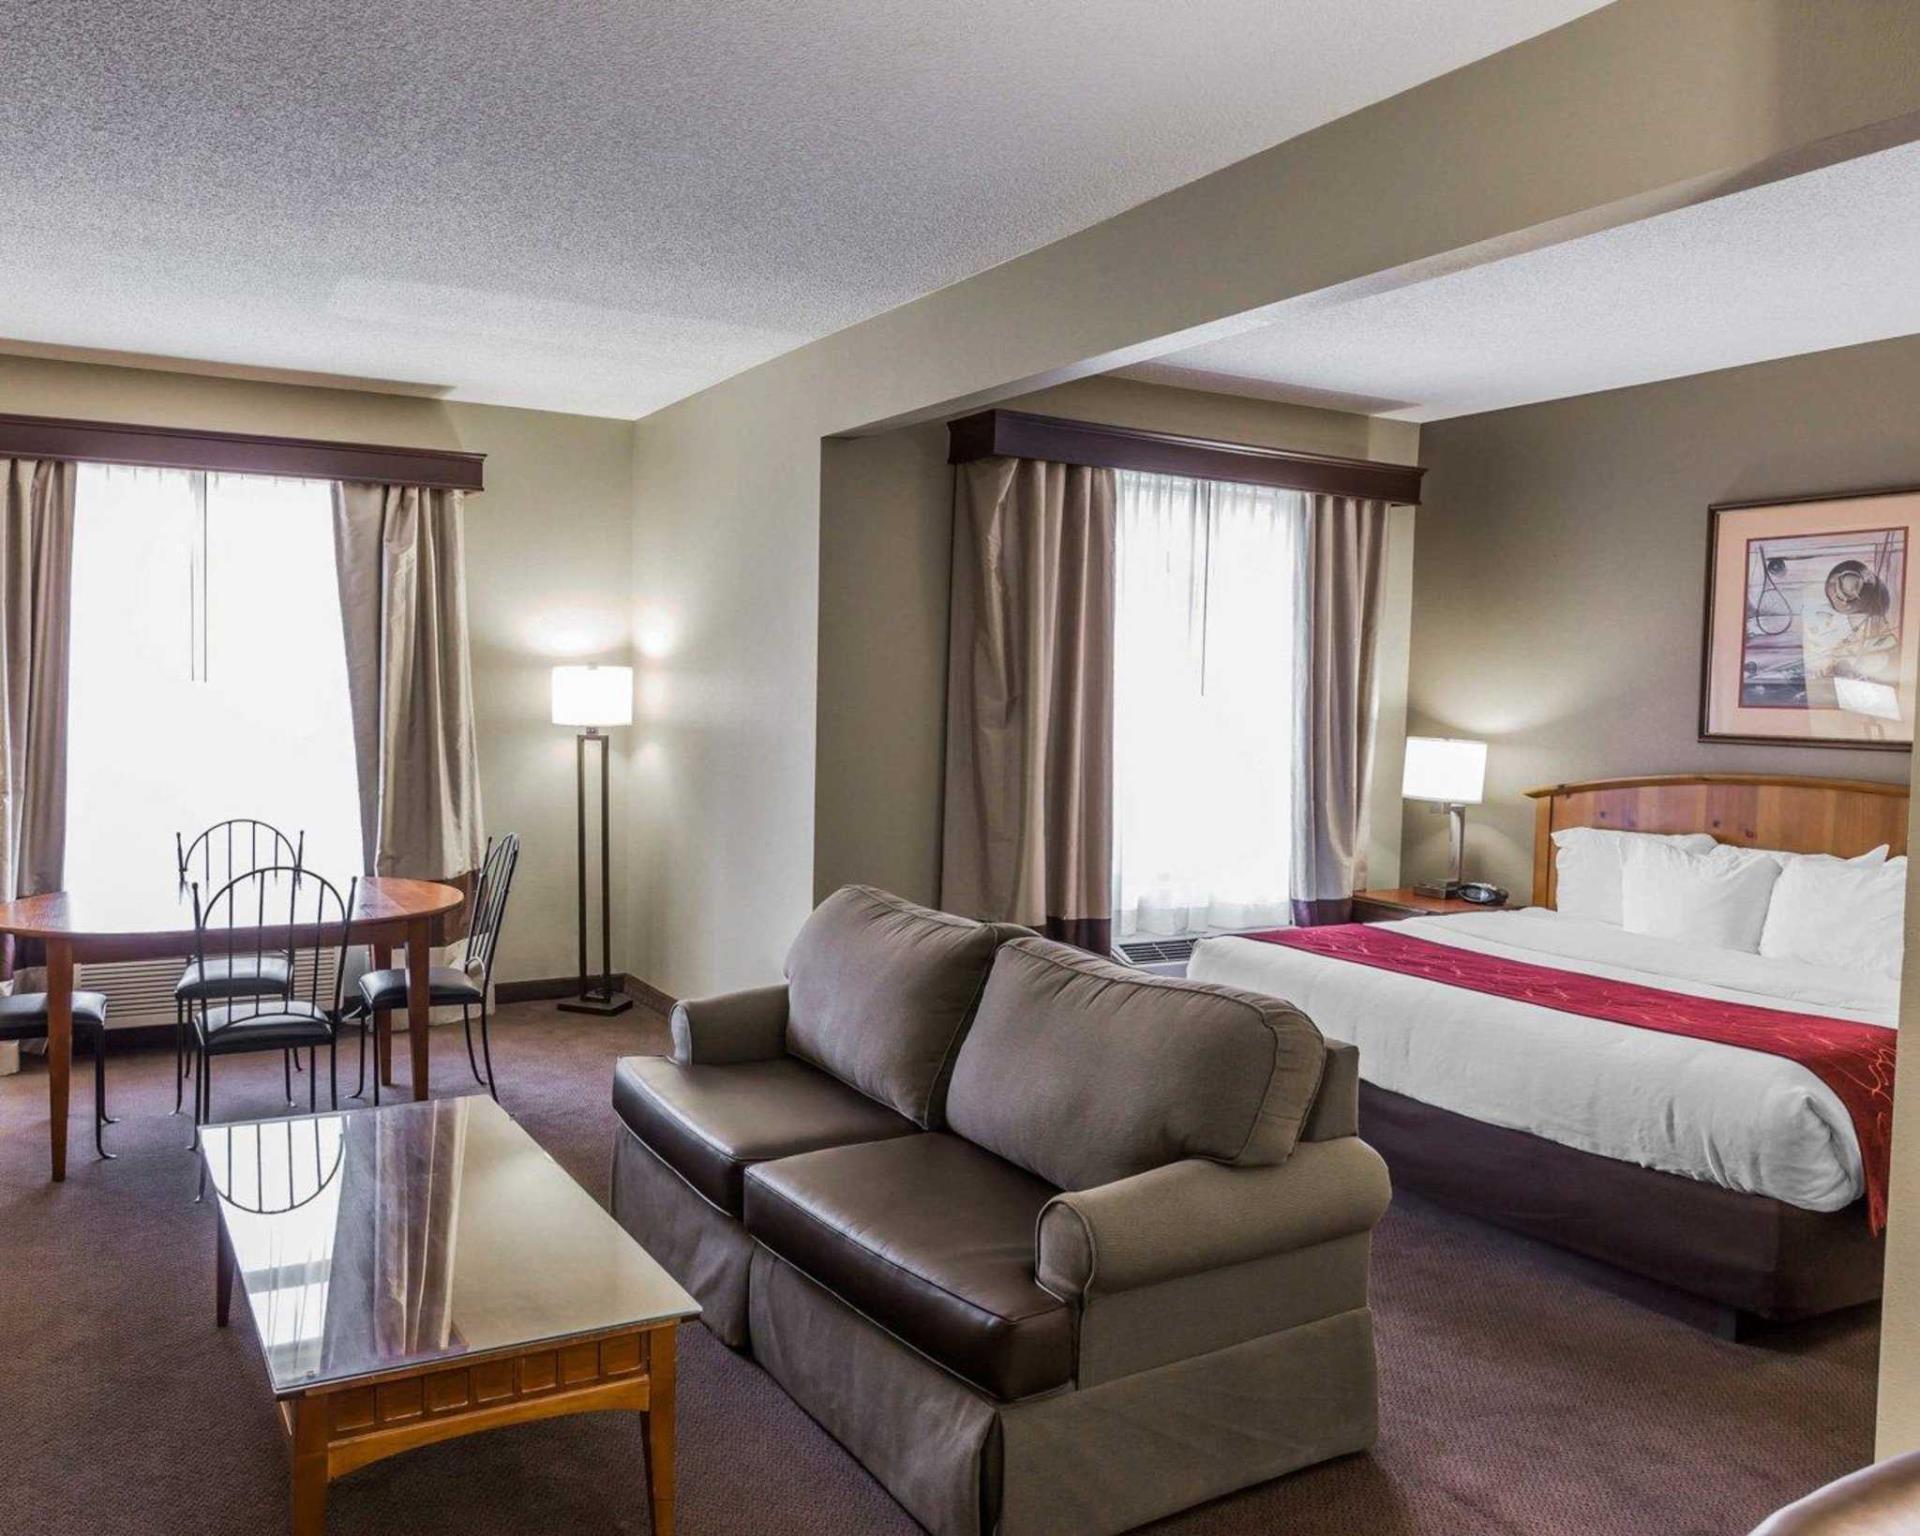 comfort suites boone in boone nc room deals photos. Black Bedroom Furniture Sets. Home Design Ideas